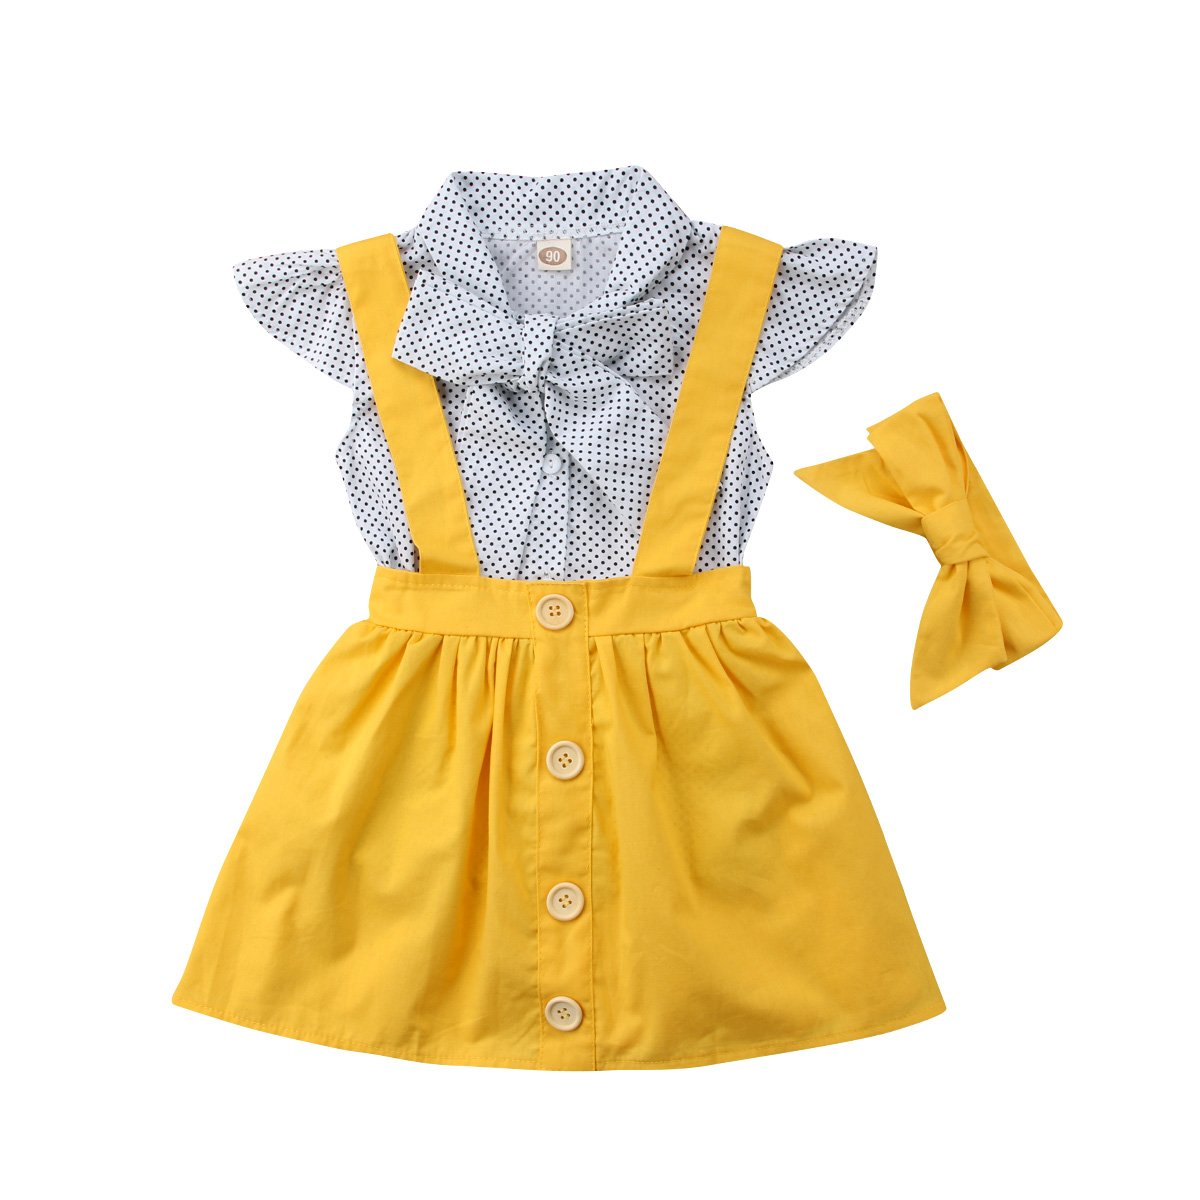 Toddler Baby Girls Polka Dot Short Sleeve Bowknot Shirt Tops+Suspender Braces Skirt Overalls with Headband